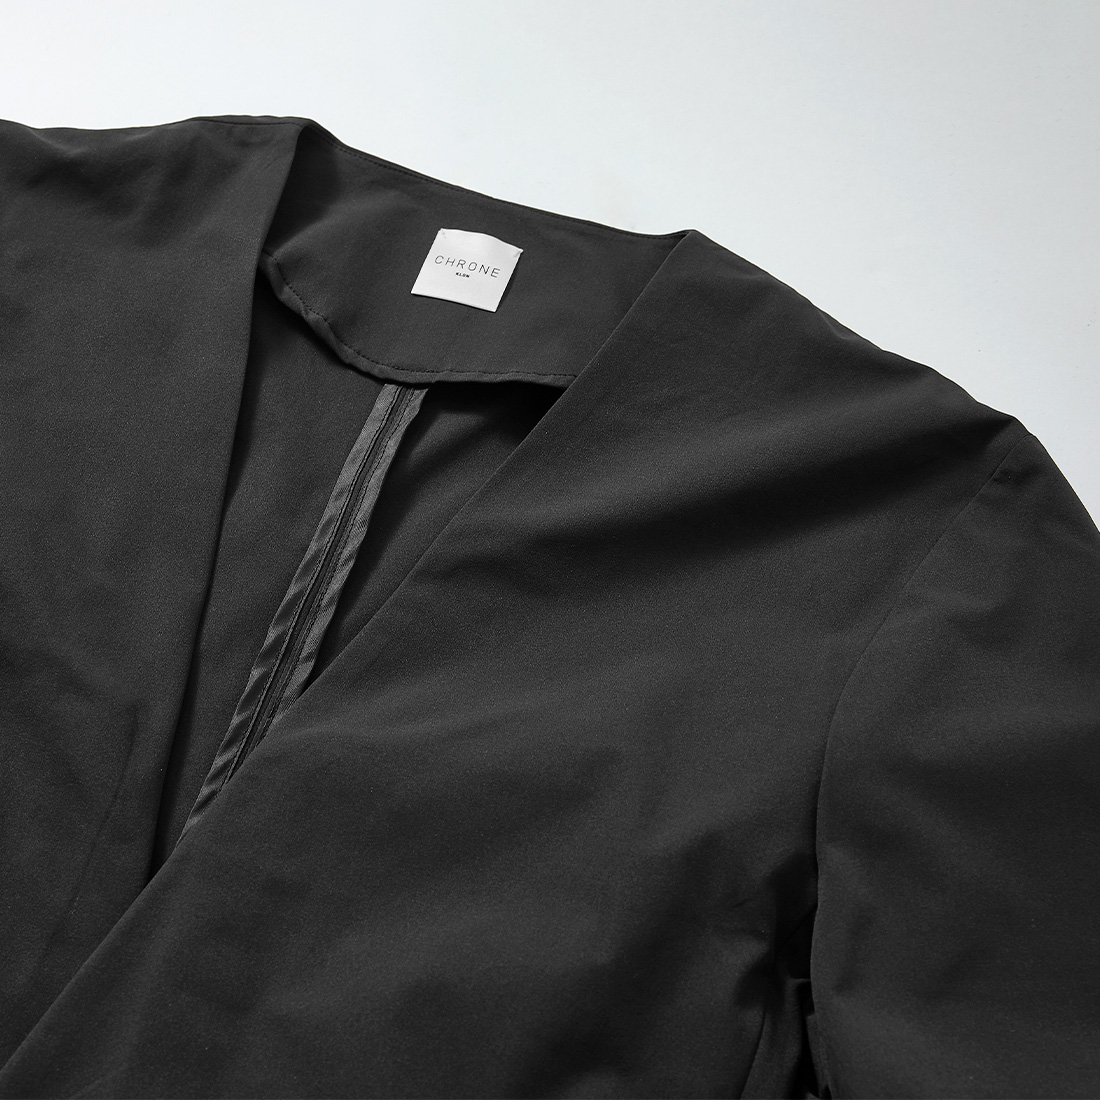 borderless no-collar jacket -male-の商品写真4